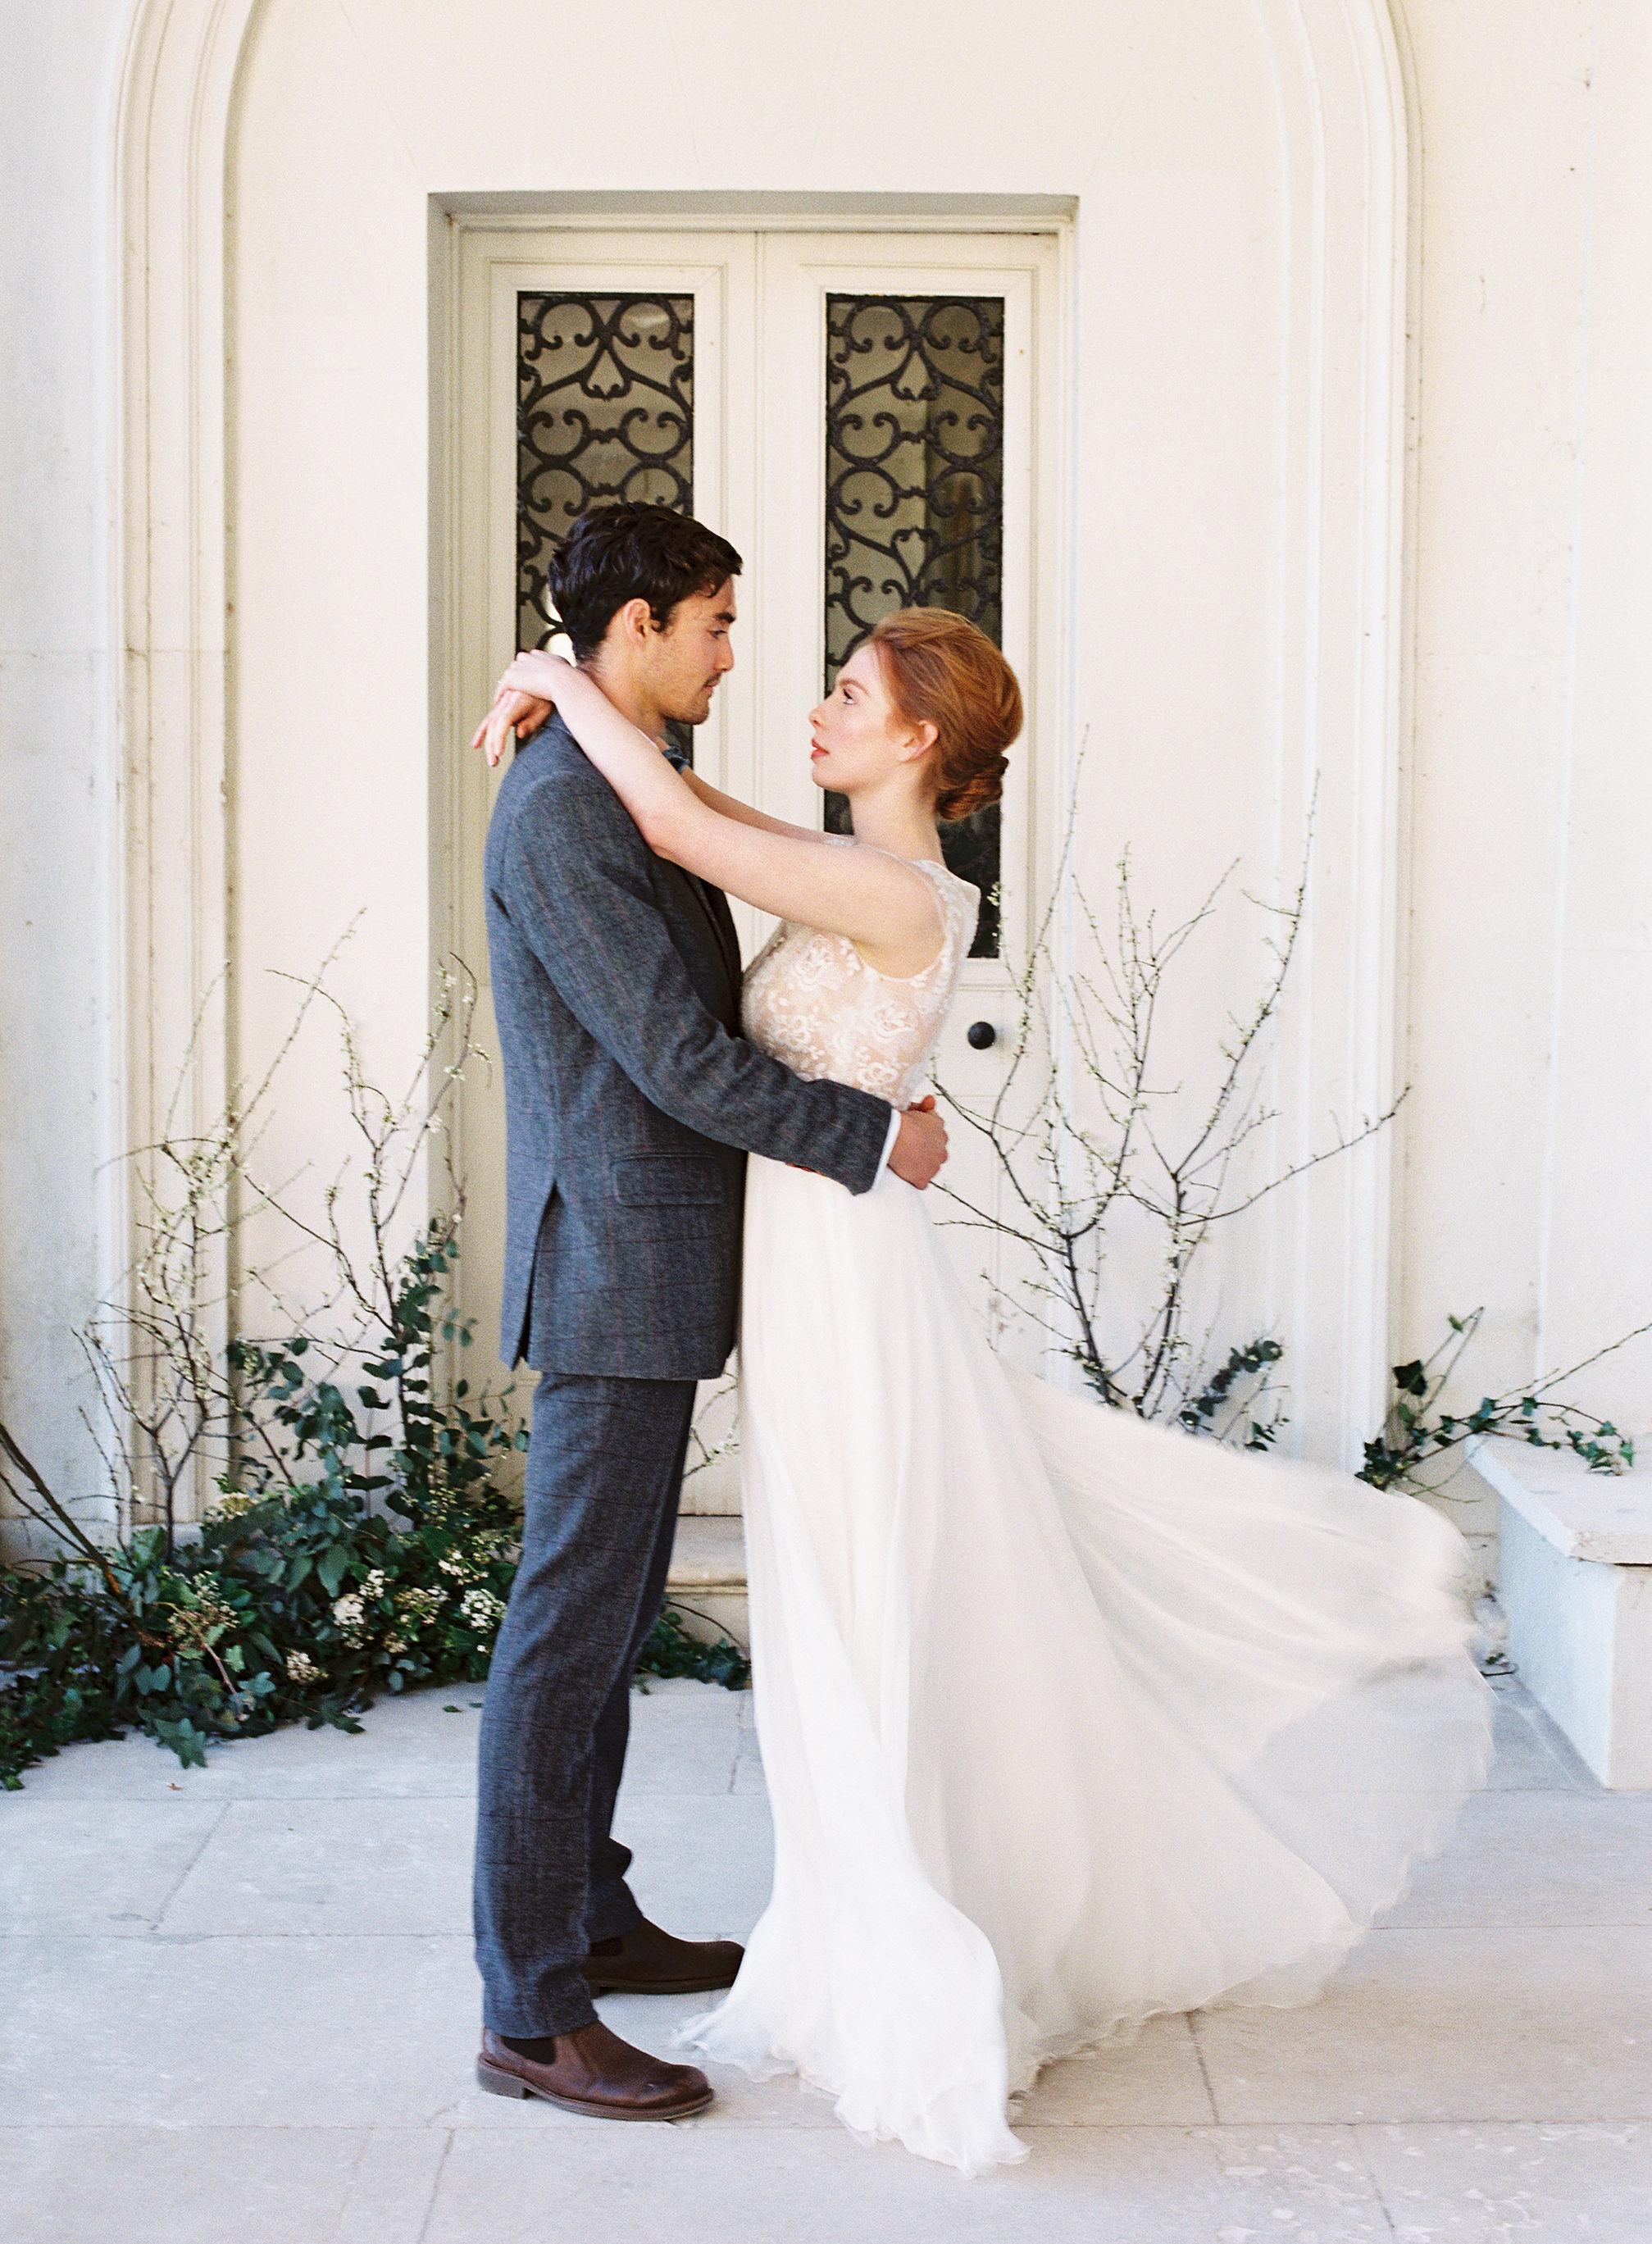 The Timeless Stylist-A Forgotten Love Story-Fine Art Wedding Editorial-Heirloom Wedding Styling 61.jpg